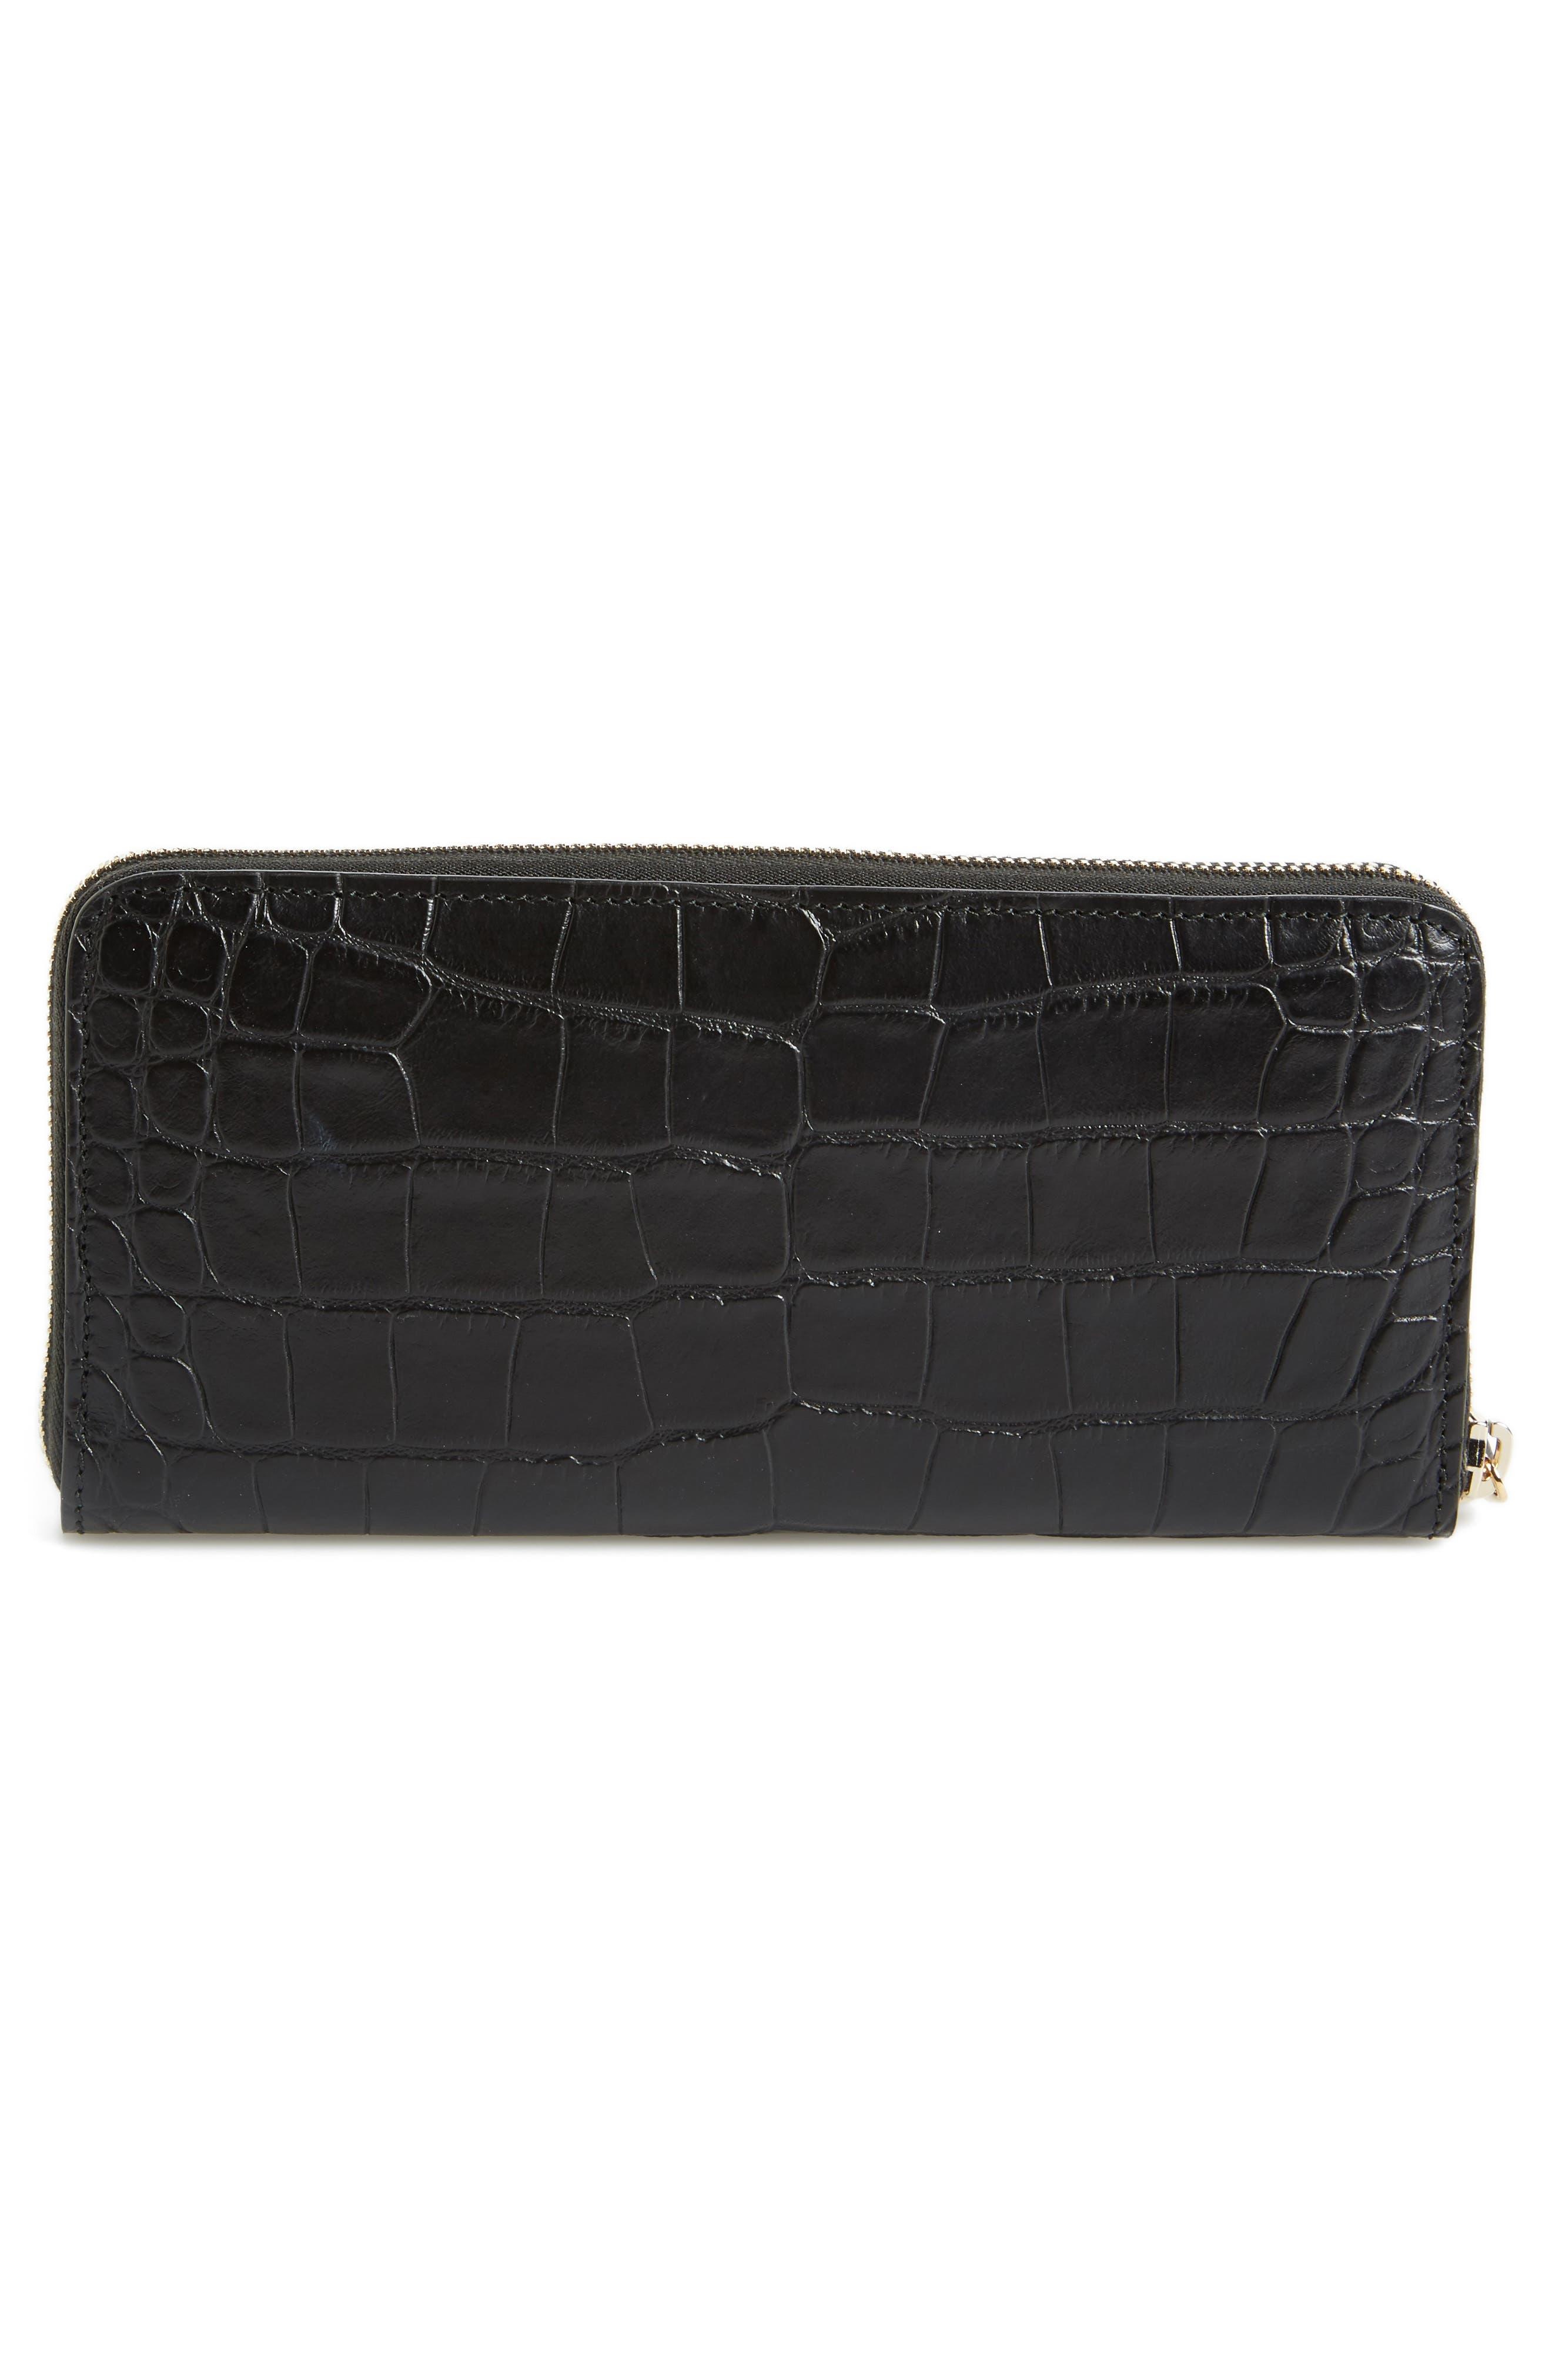 Croc-Embossed Leather Zip Around Wallet,                             Alternate thumbnail 4, color,                             BLACK